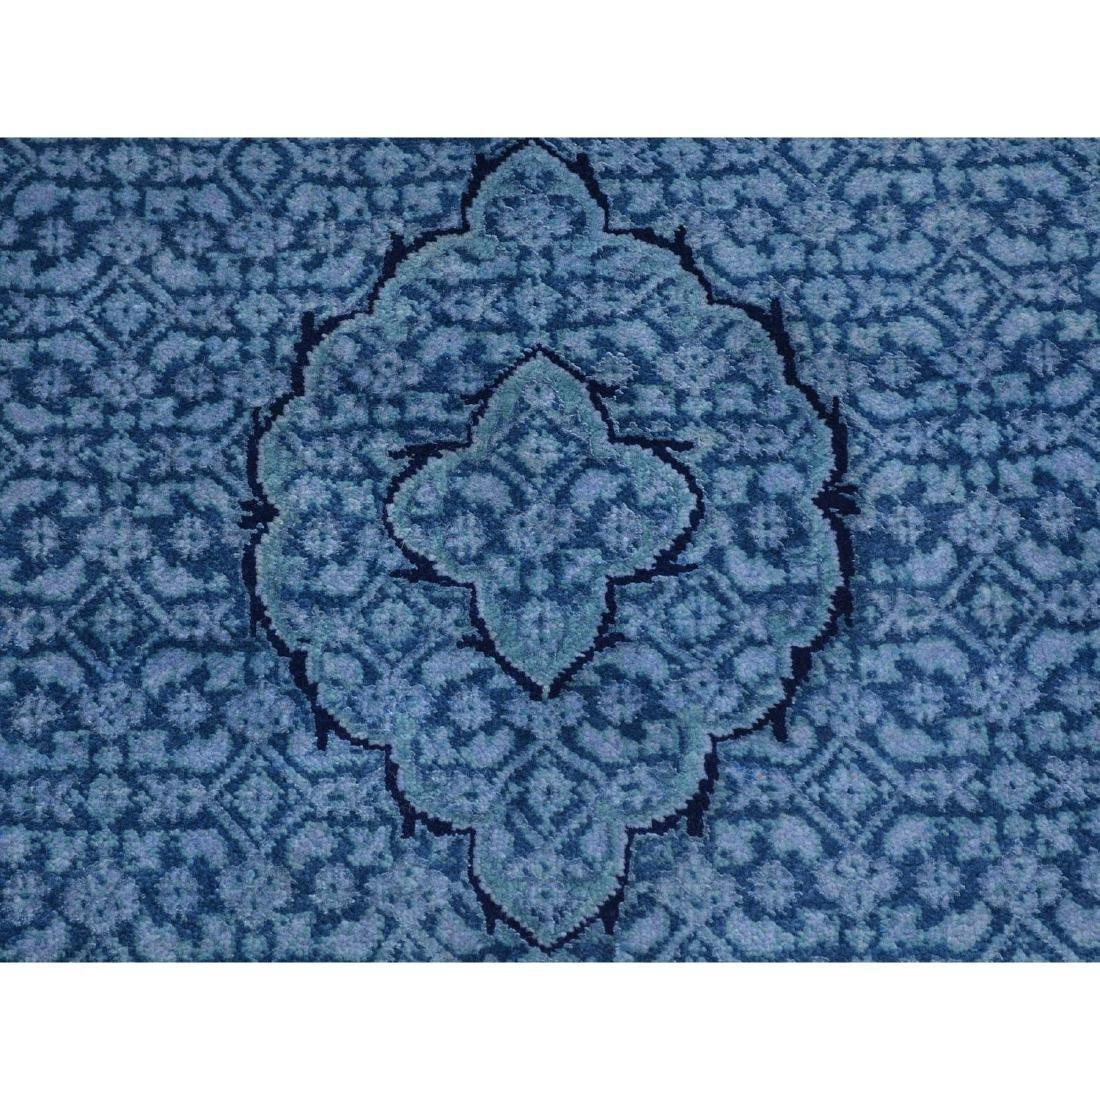 Wool and Silk Tabriz Mahi Runner Oriental Rug Handmade - 4